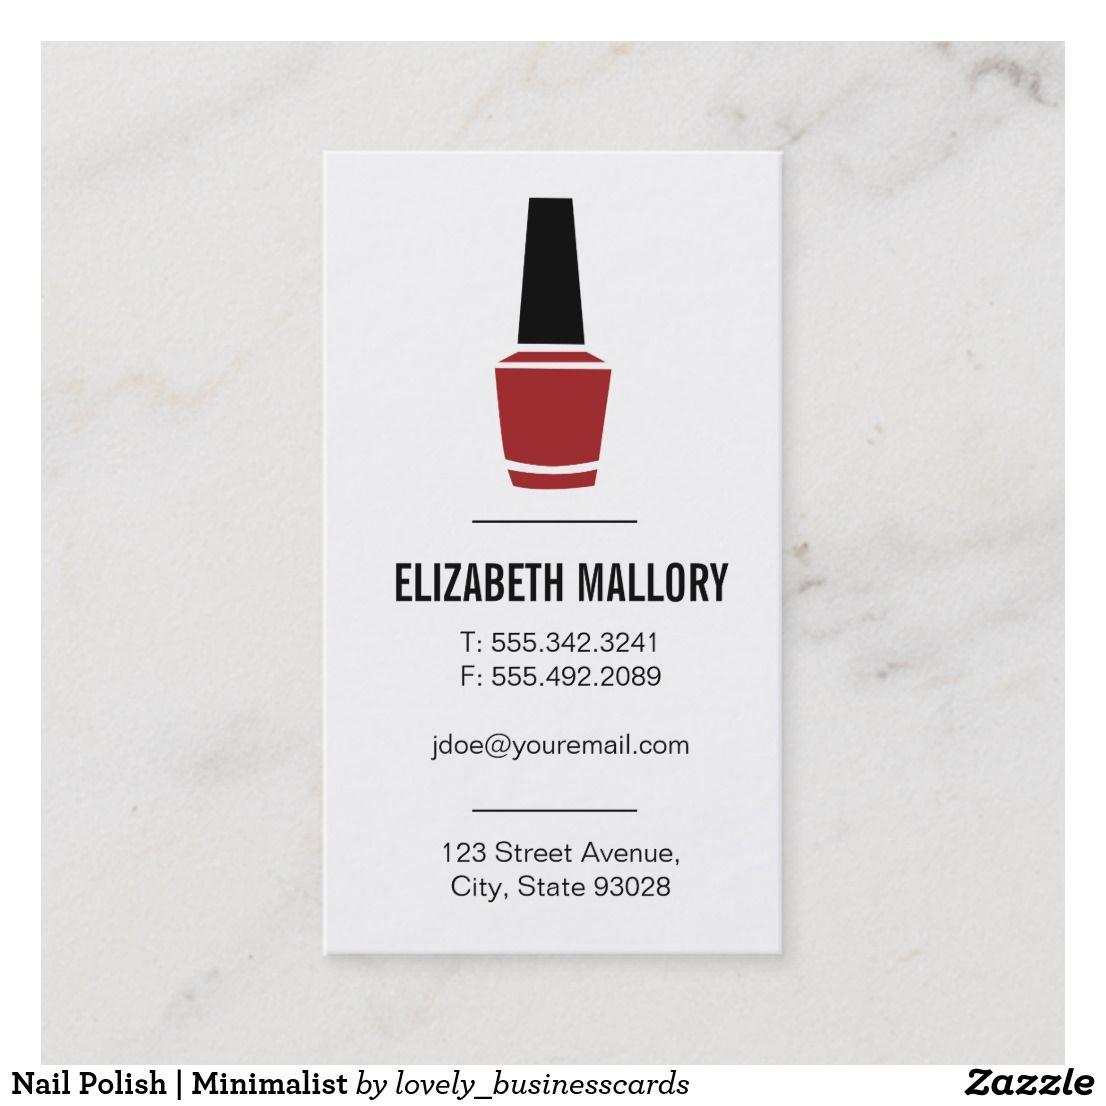 Nail Polish   Minimalist Business Card  #businesscards #businessowner #nailpolish #nails #manicure #nailsalon #nailtechnician #manicurist #manicuristlife #manicureproblems #beautysalon #nailpolishbottle #nailsalonowner #womensbeauty